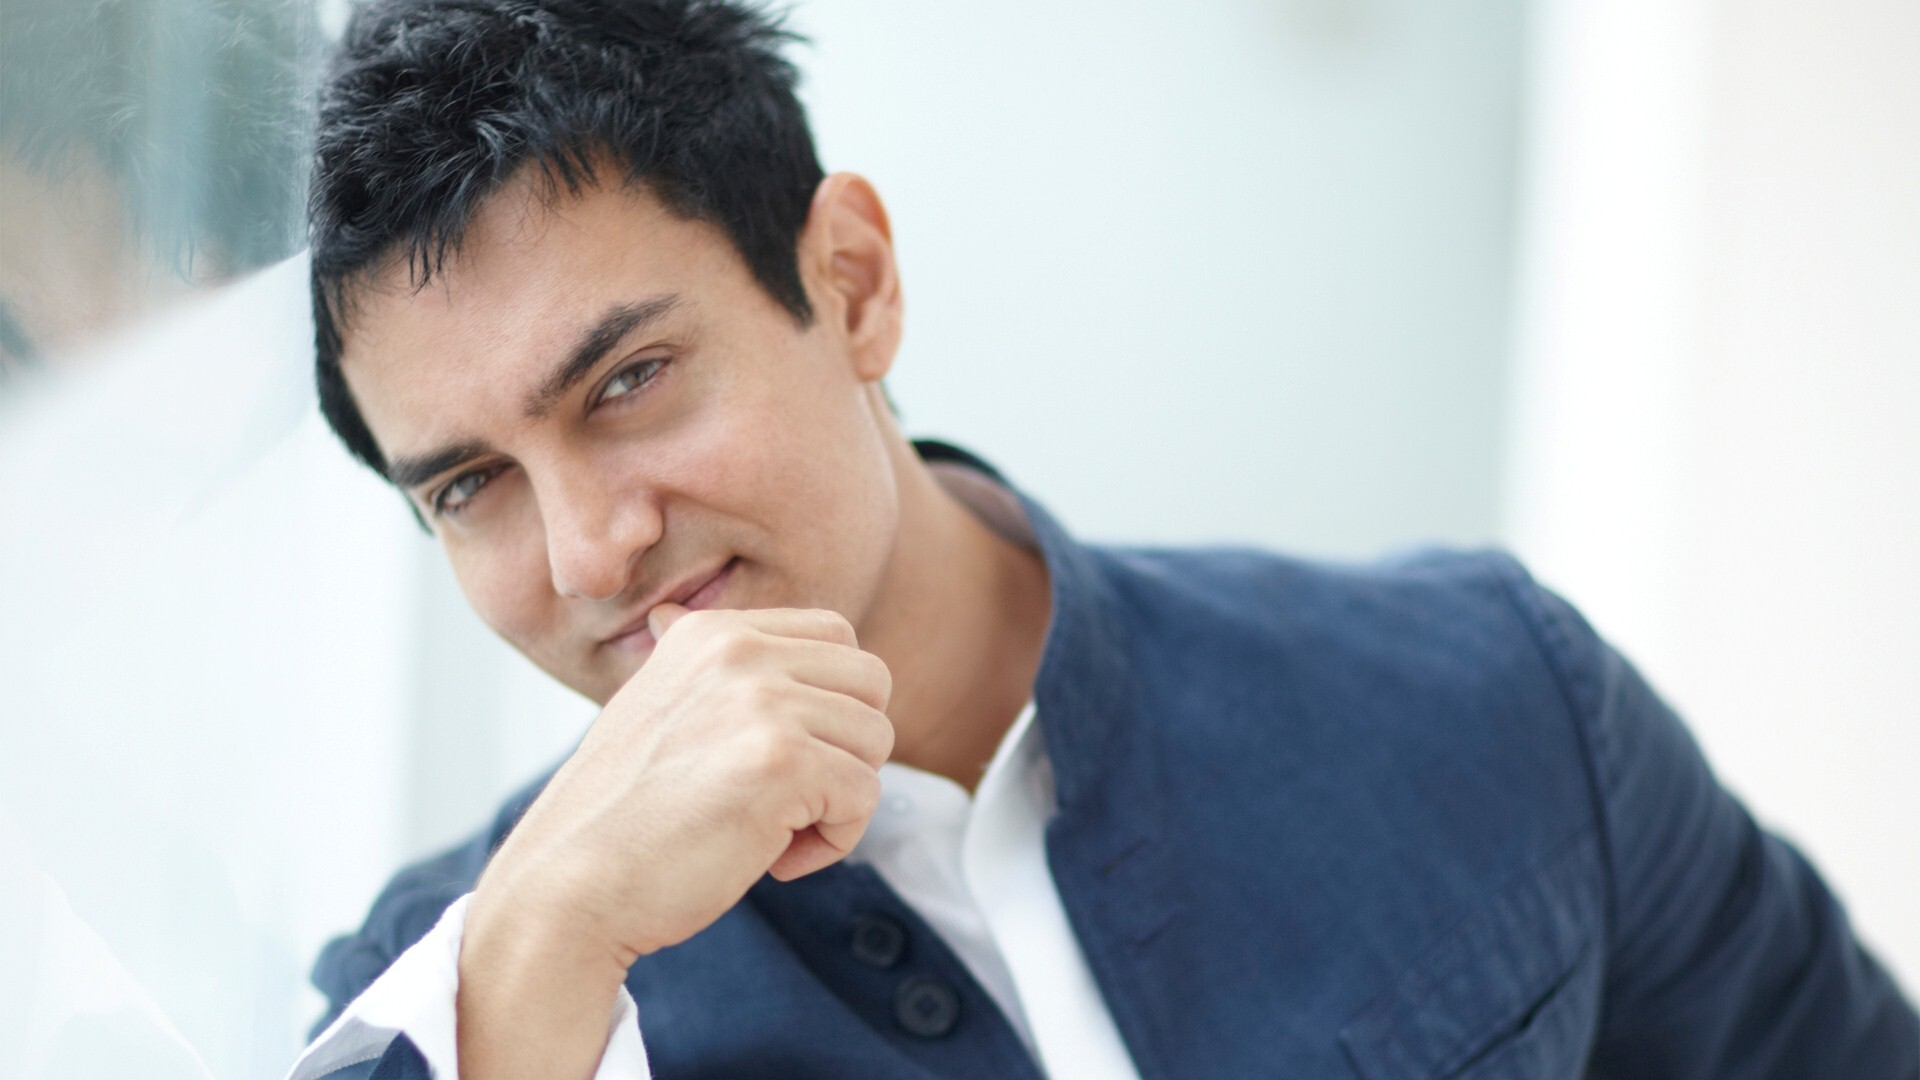 Aamir khan hd desktop wallpapers hd wallpapers - Aamir khan hd wallpaper ...